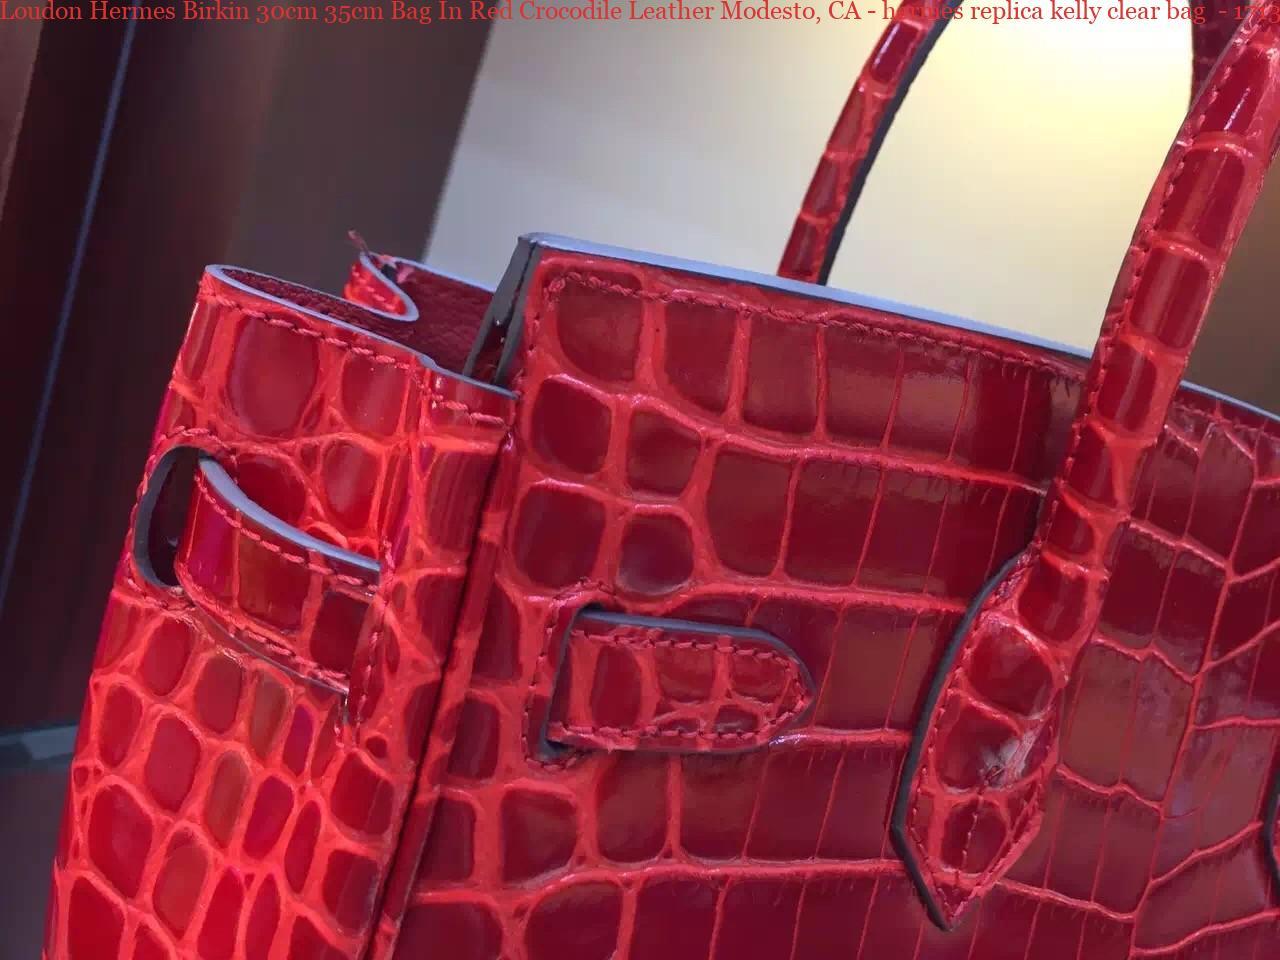 298697c6245 Loudon Hermes Birkin 30cm 35cm Bag In Red Crocodile Leather Modesto ...